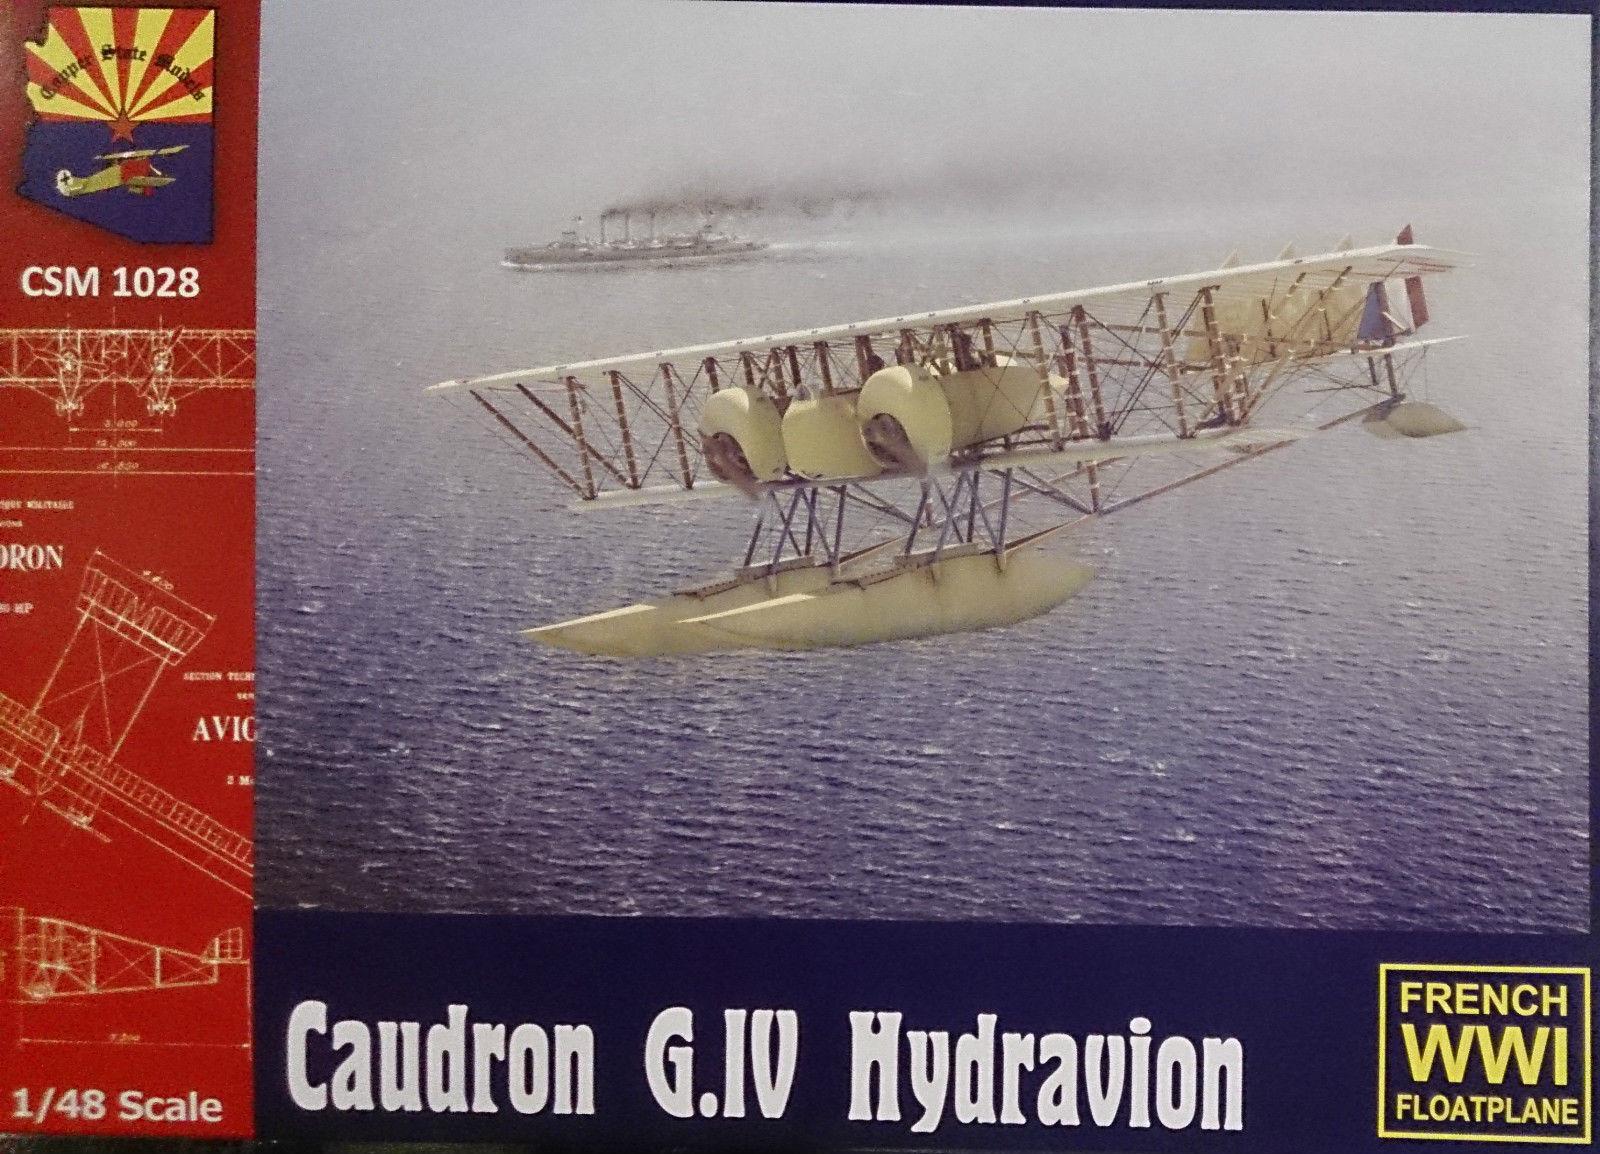 1 48 Copper State Models  K1028 - Caudron G.IV Floatplane